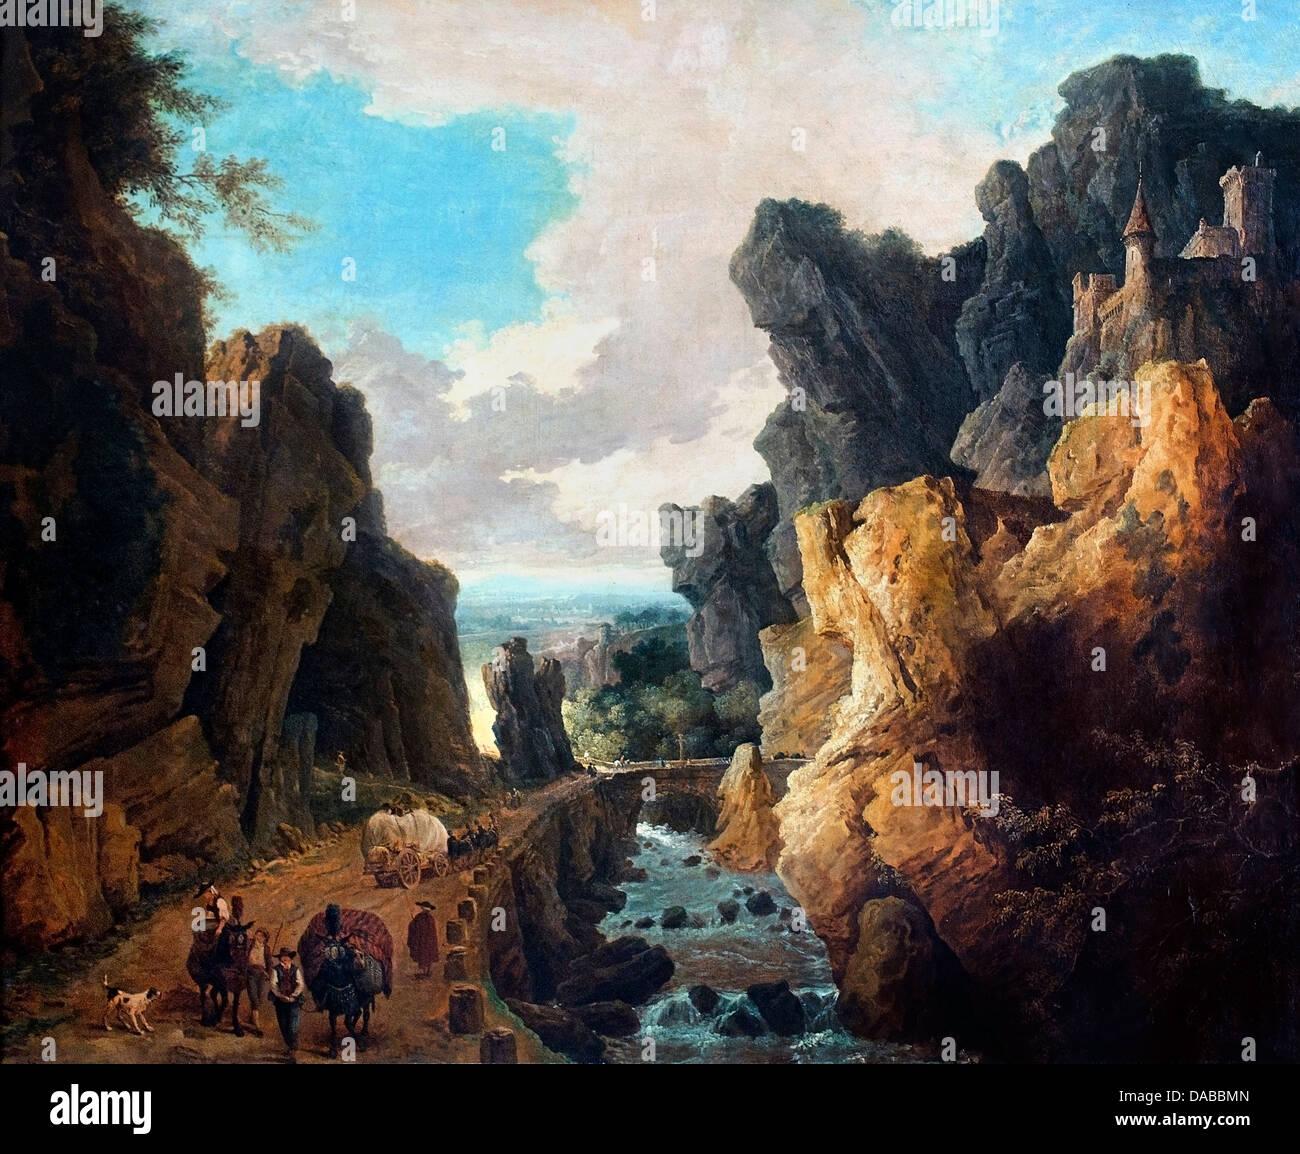 Gorges Ollioules 1753 Hubert Robert 1733-1808 France - Stock Image